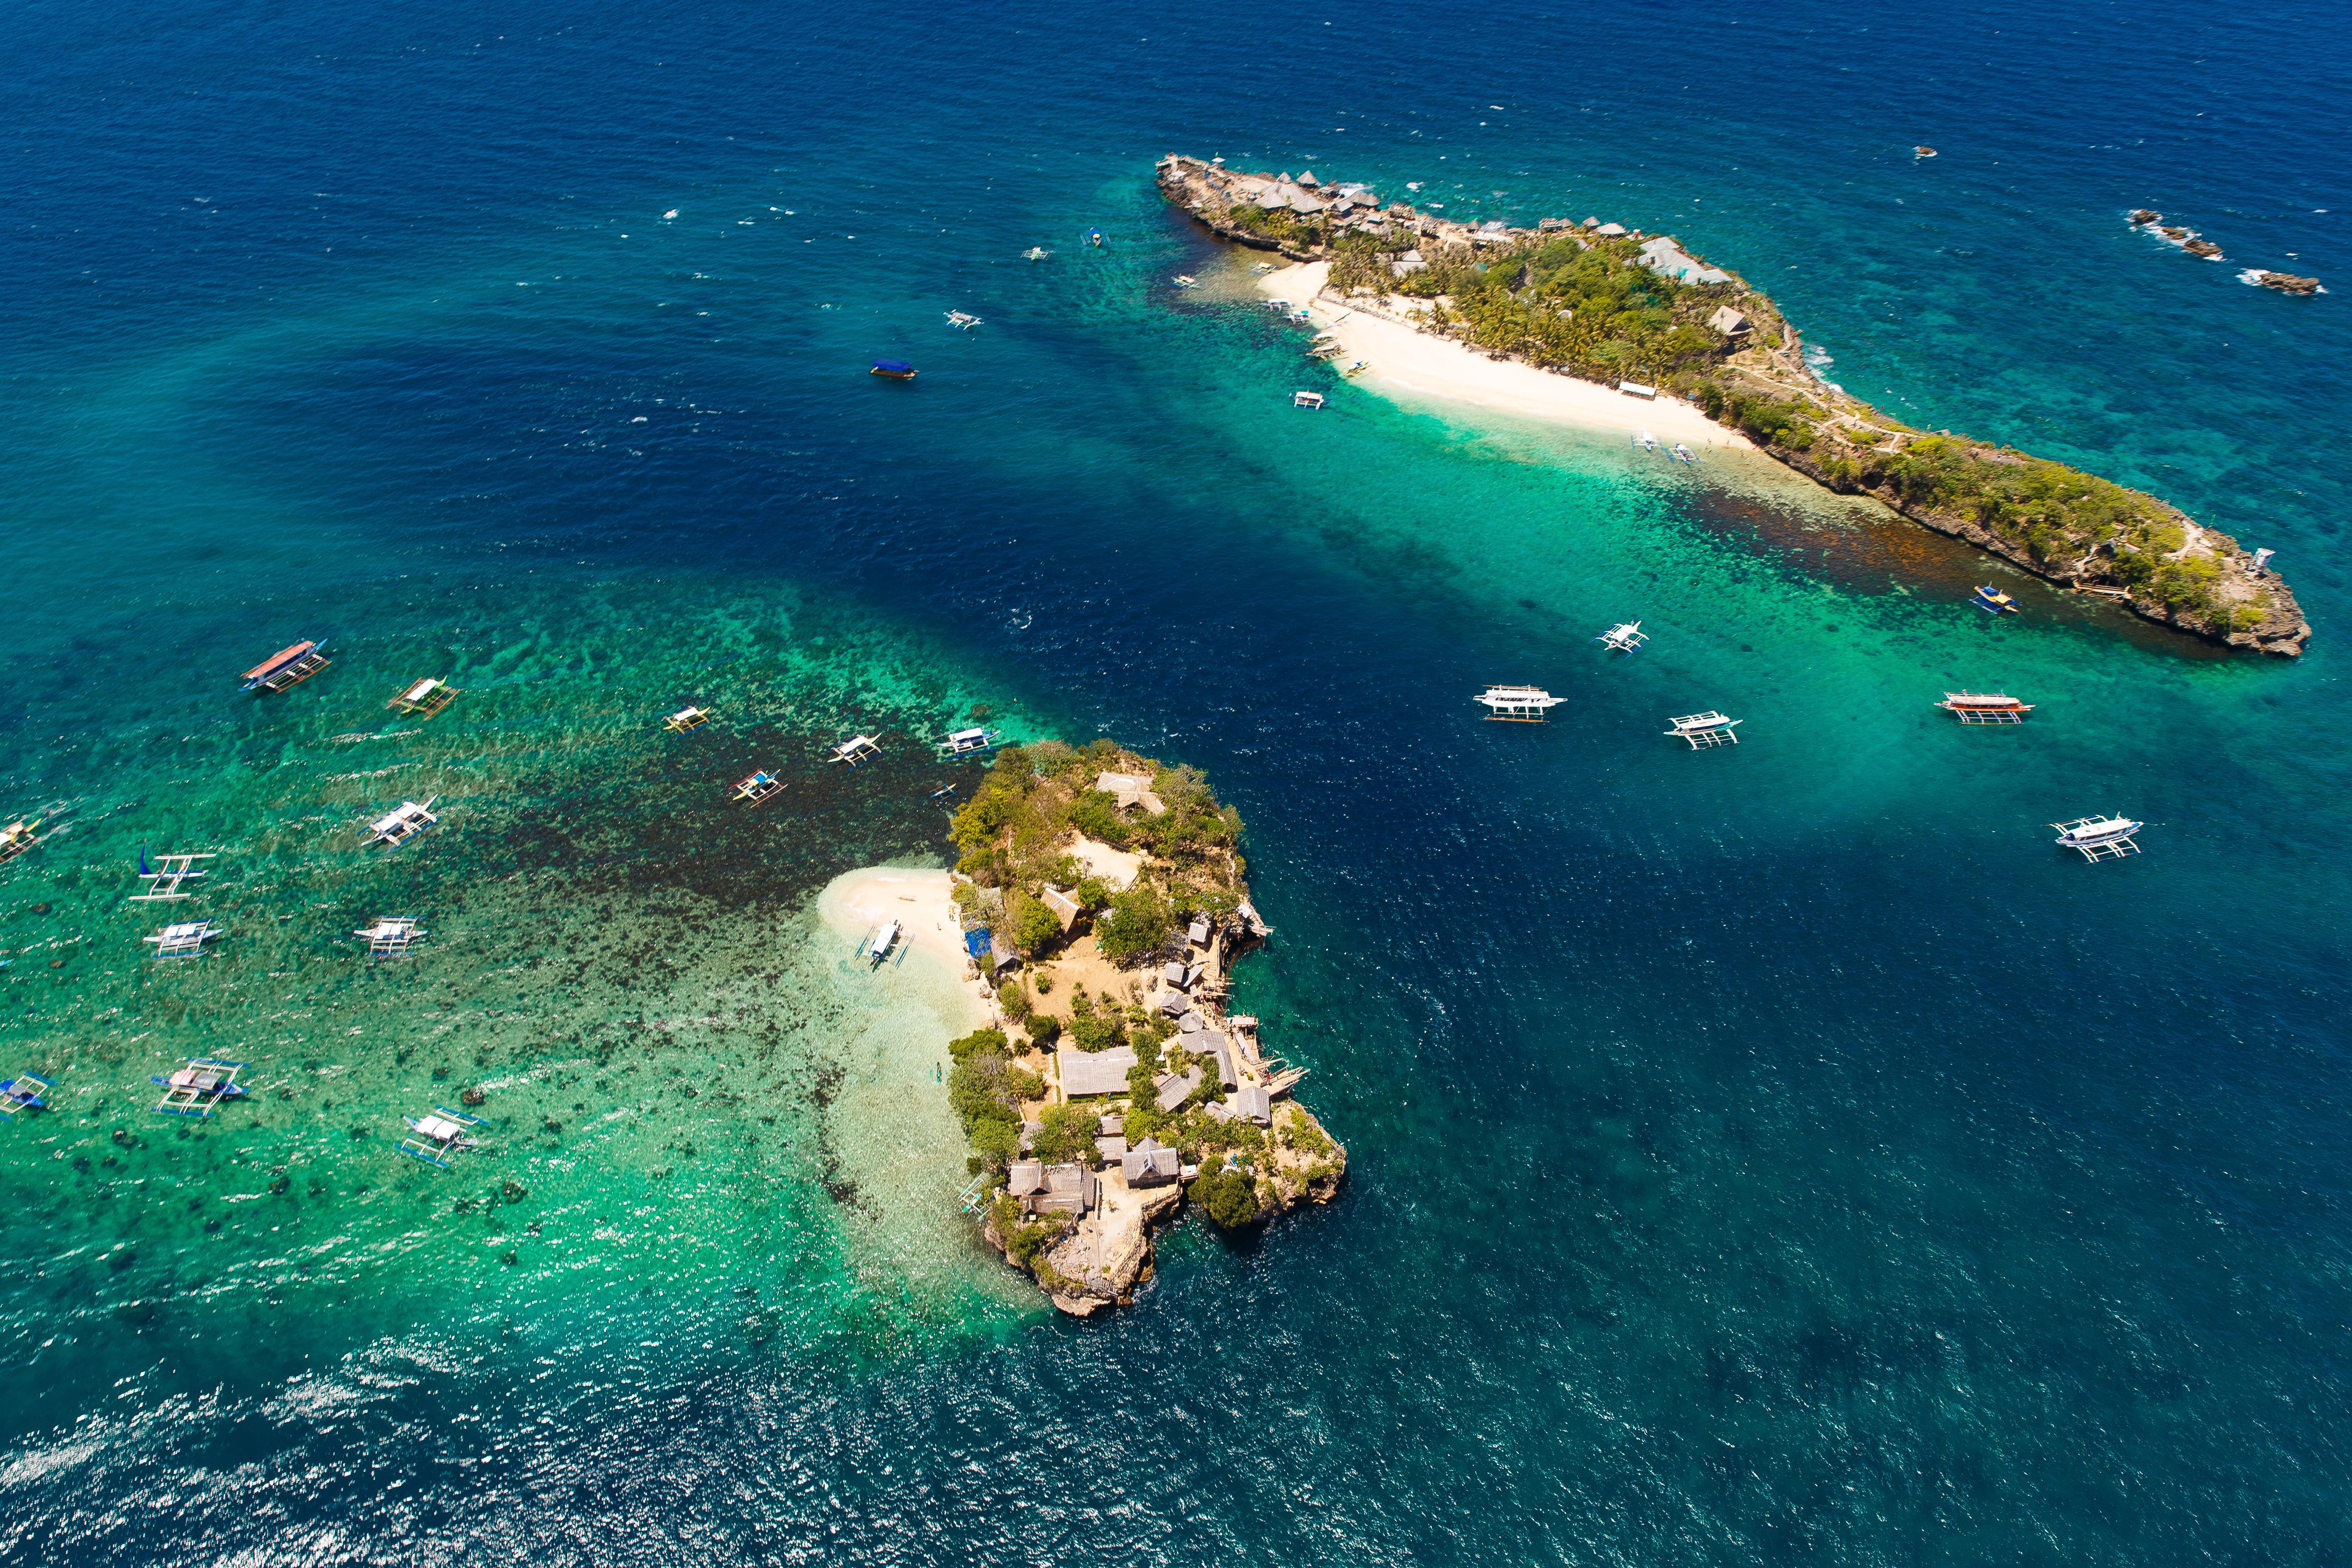 Optional tour of island hopping in Boracay Island